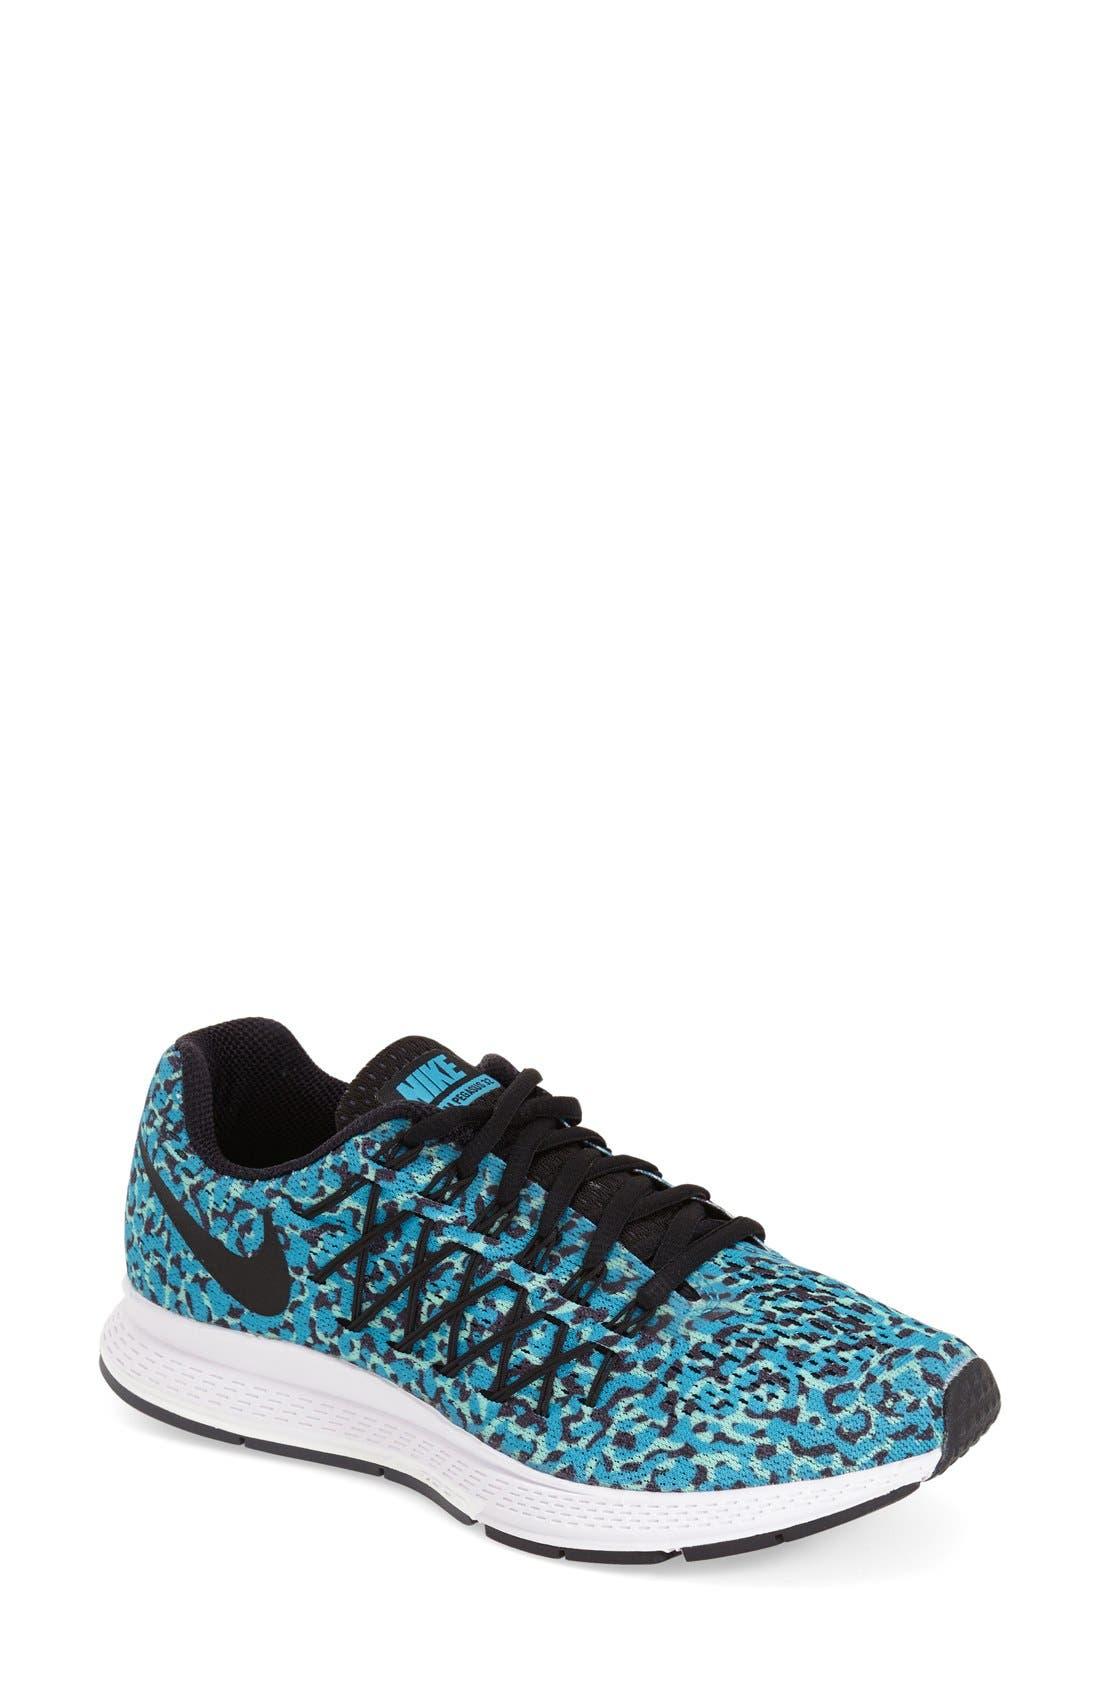 Alternate Image 1 Selected - Nike 'Air Zoom Pegasus 32' Running Shoe (Women)